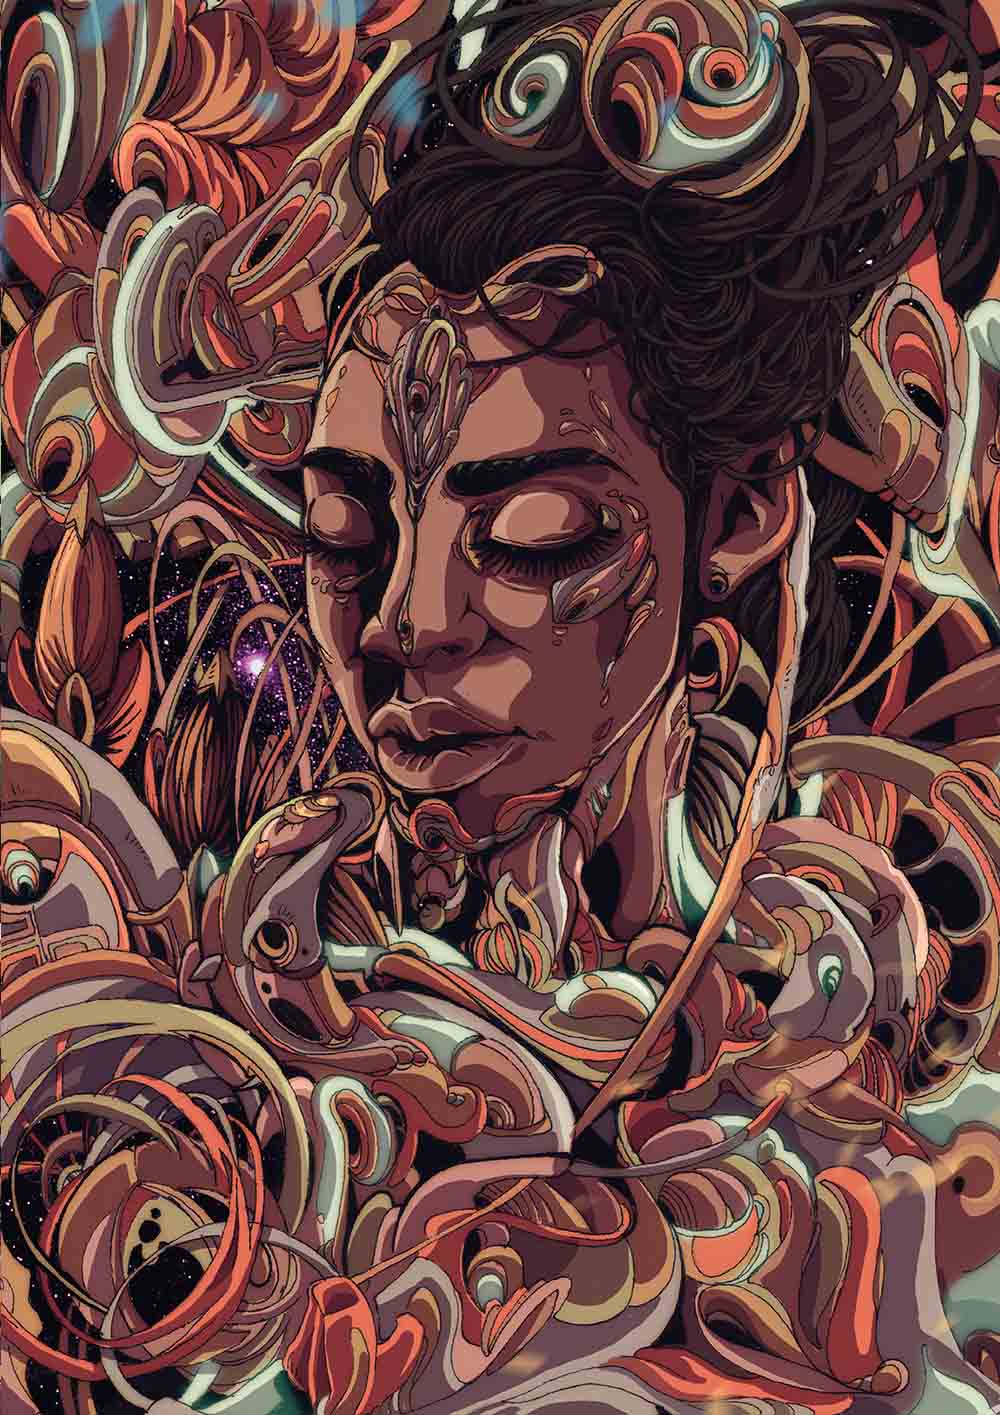 Anda Mncayi, Dreaming-Awake - Quintessence, 2017. A2 Inkjet, True Fibre